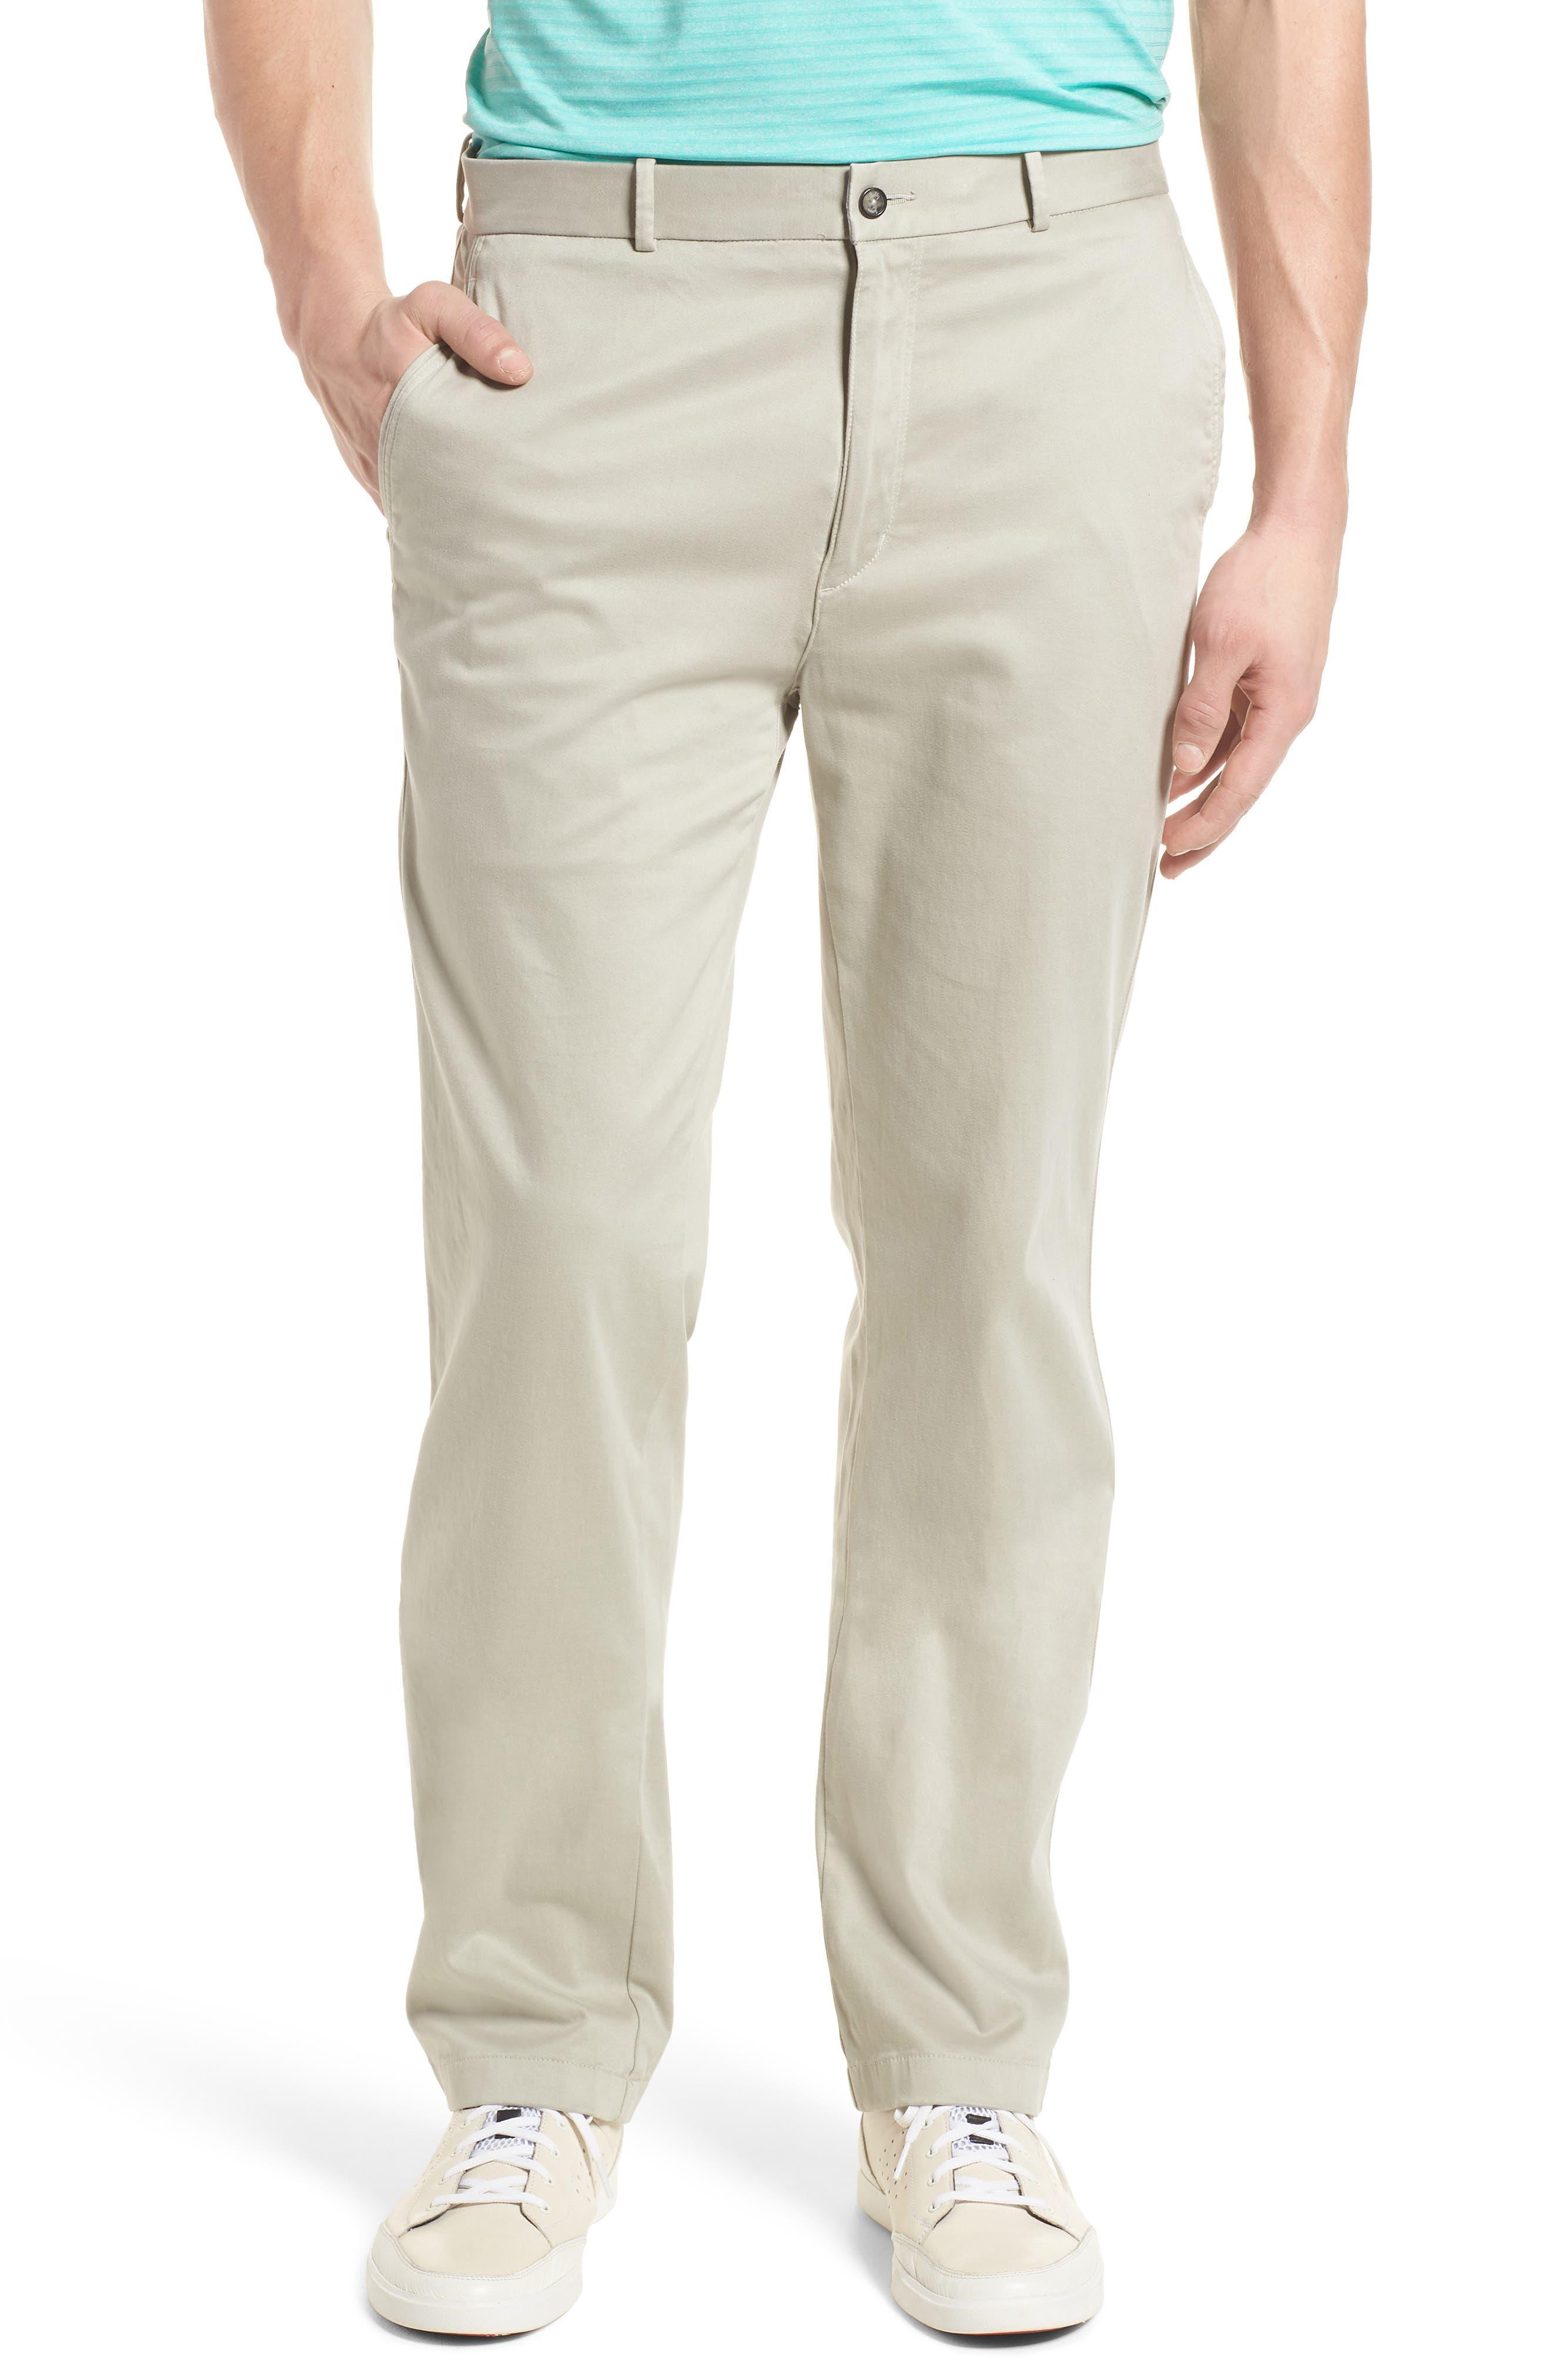 St. Charles Brushed Chino Pants,                         Main,                         color, 051